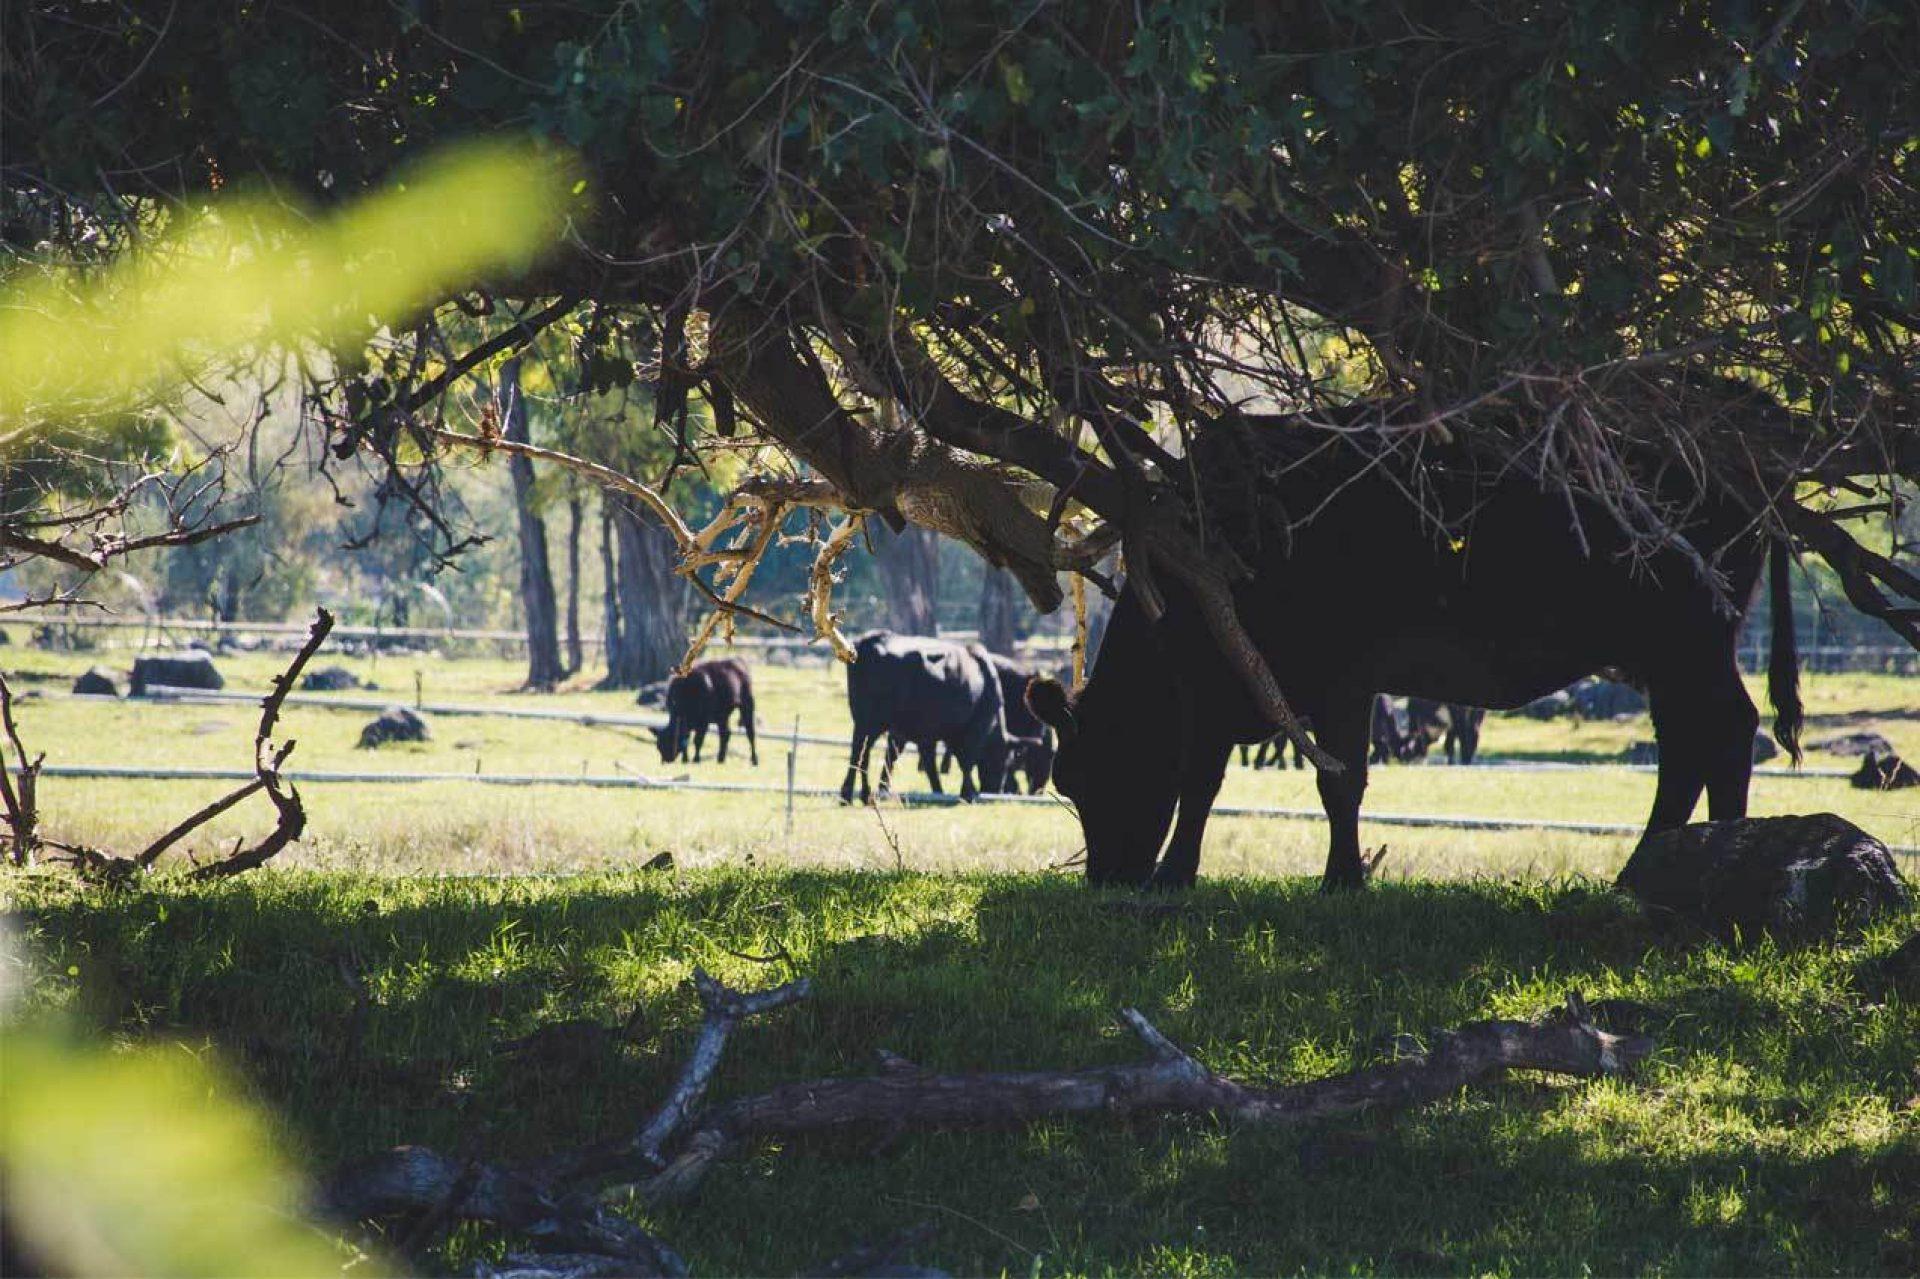 Black cows grazing under tree in grass field